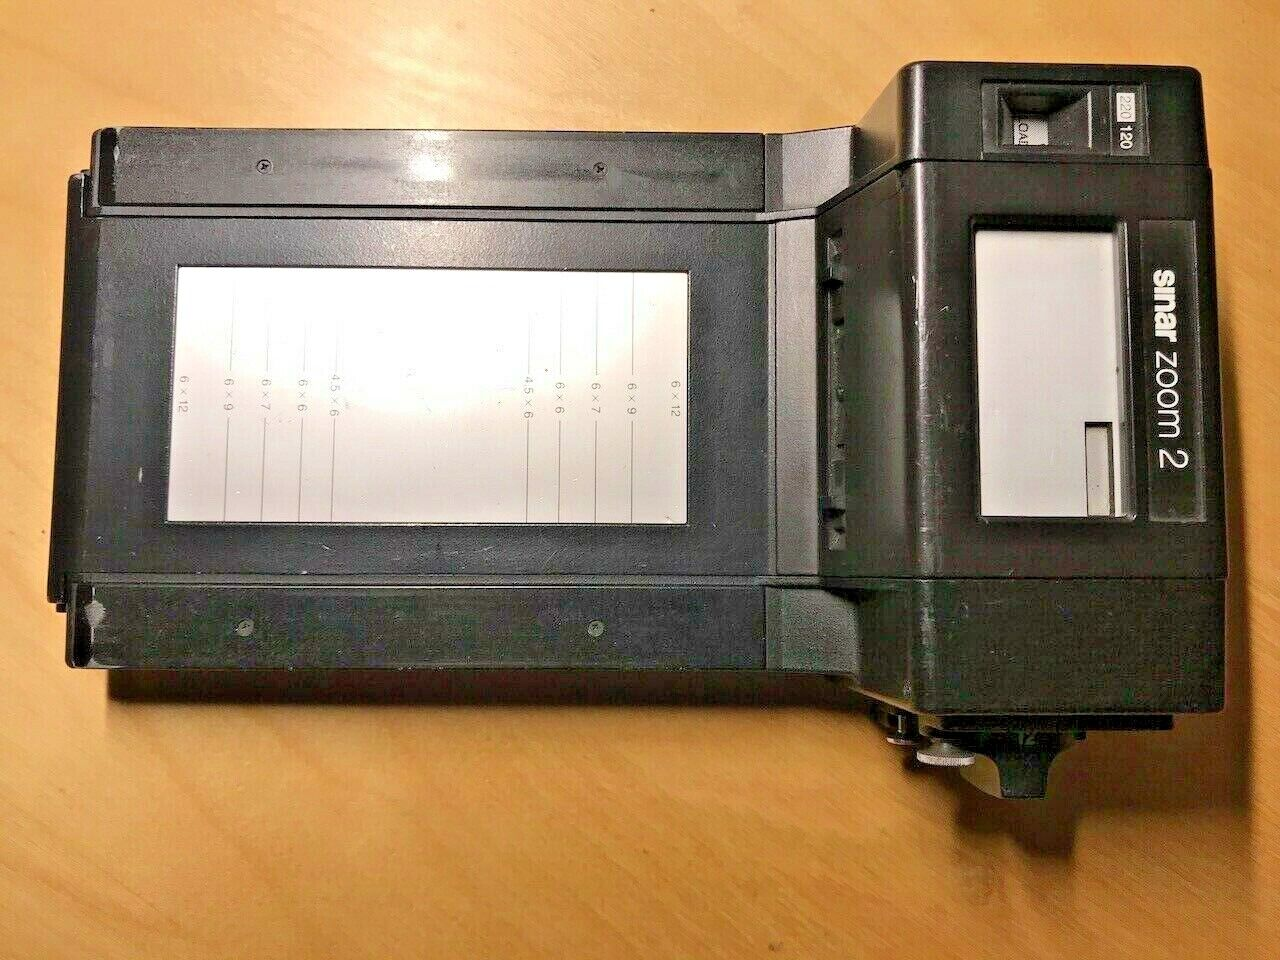 Sinar Zoom 2 Rollfilm Holder & Vario Mask 6x4,5 6x6 6x7 6x9 6x12